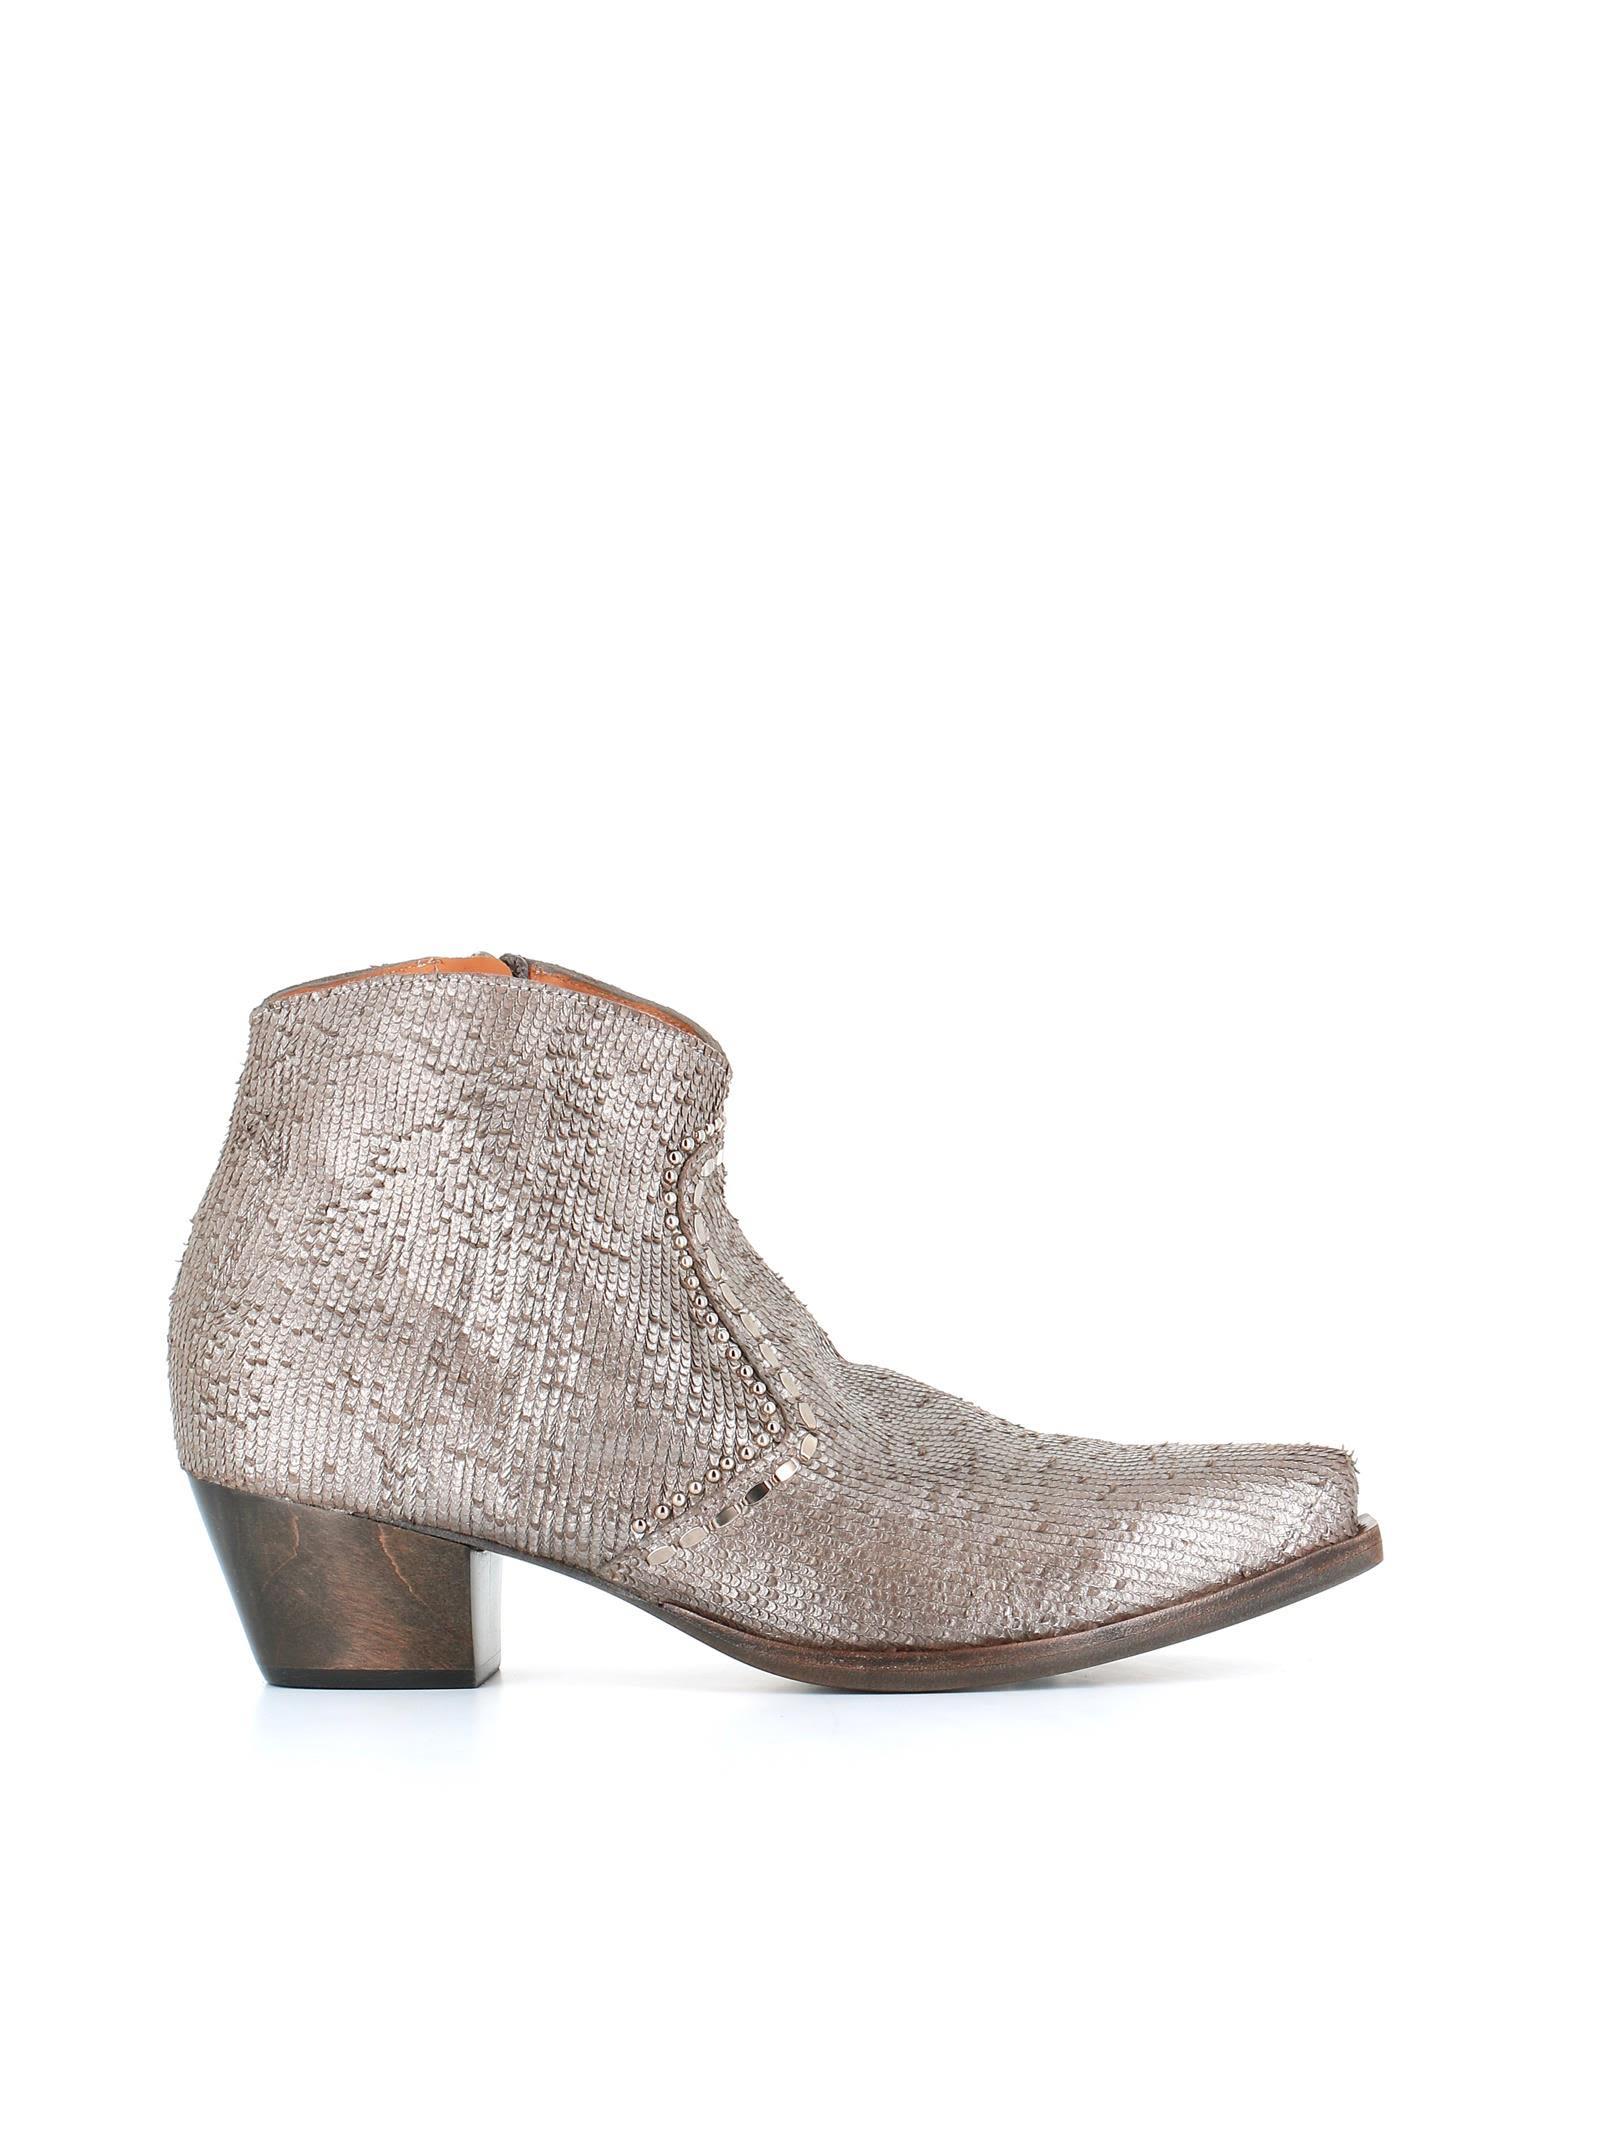 "CALLEEN CORDERO Ankle Boot ""Zima"" in Silver"